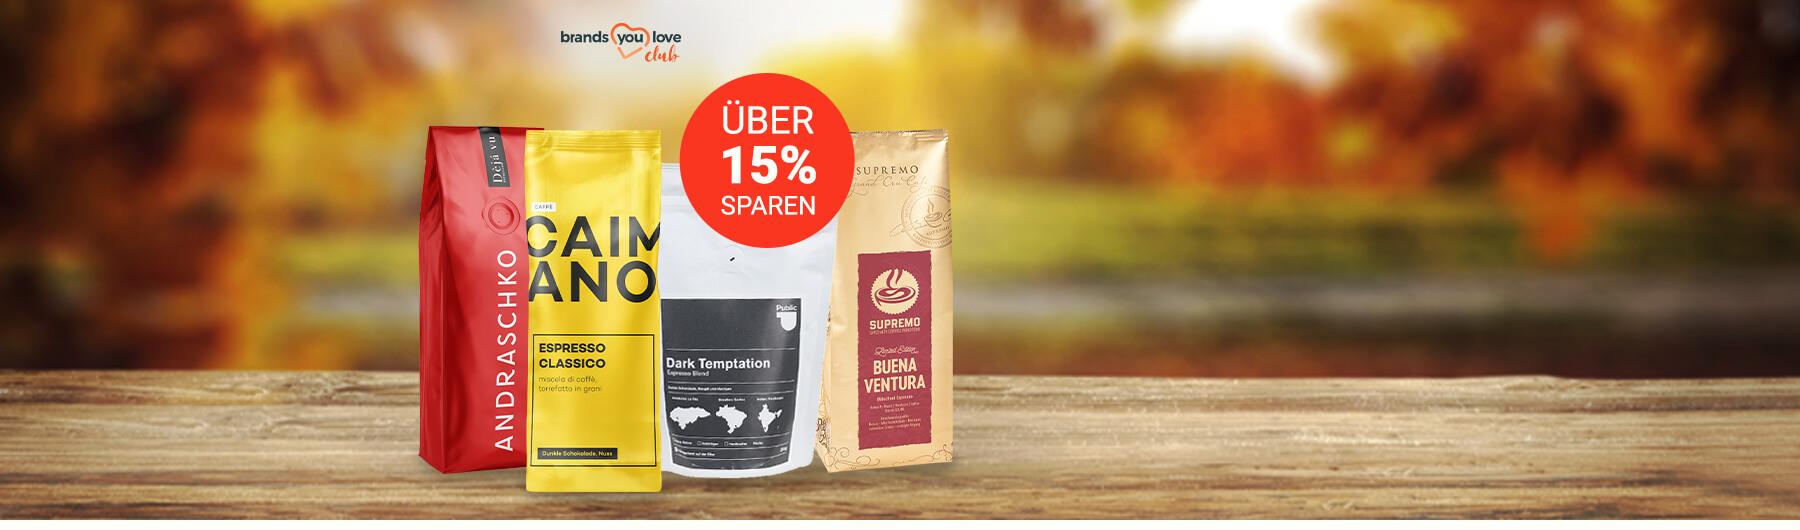 Brands you love Probierpaket